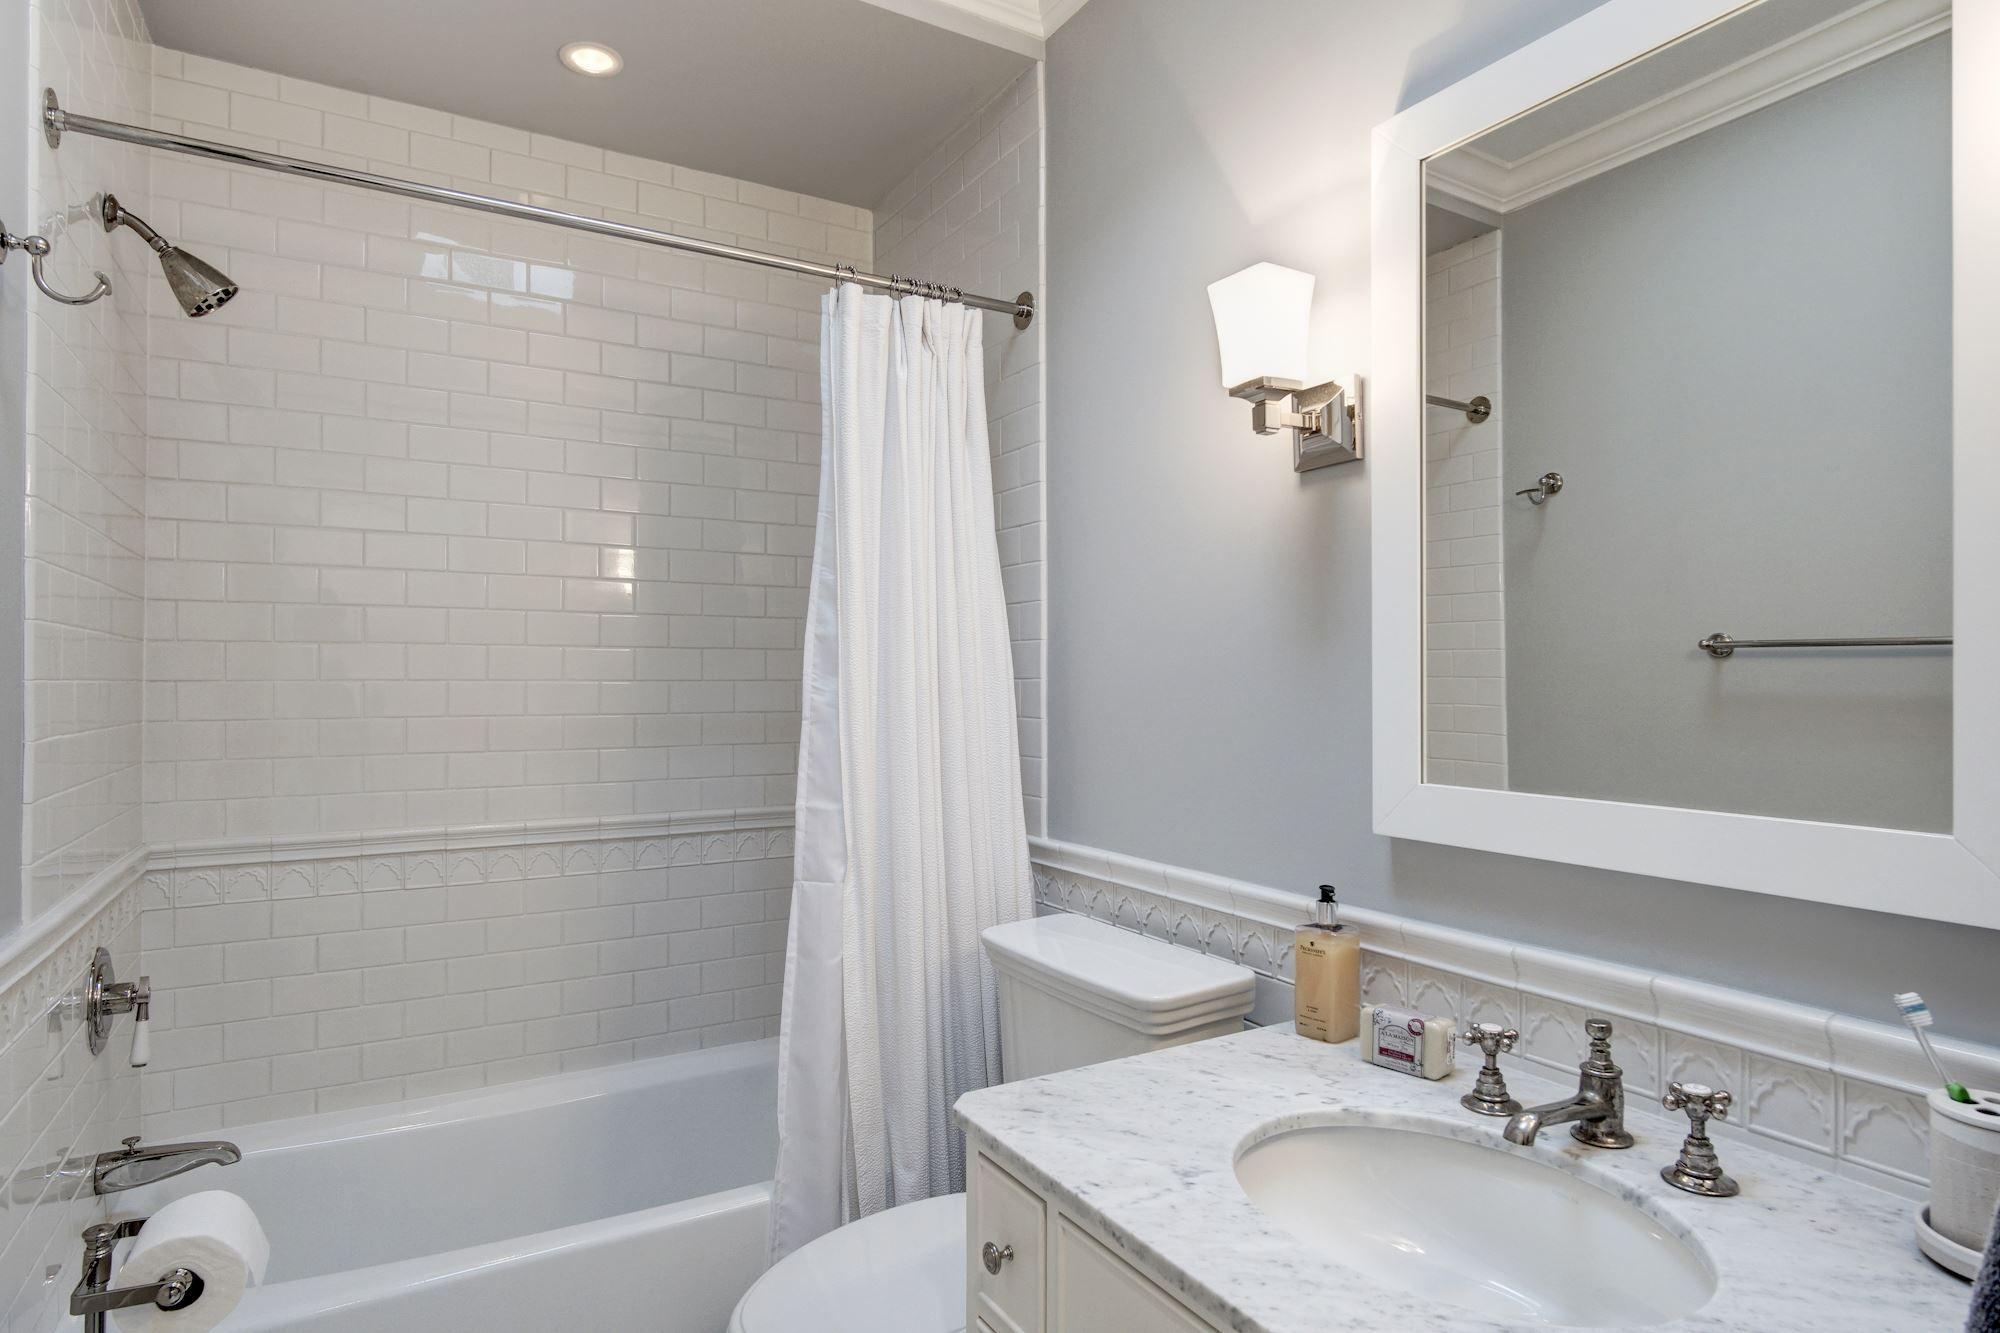 Bathroom 2 Bathroom Lighted Bathroom Mirror Heating Systems